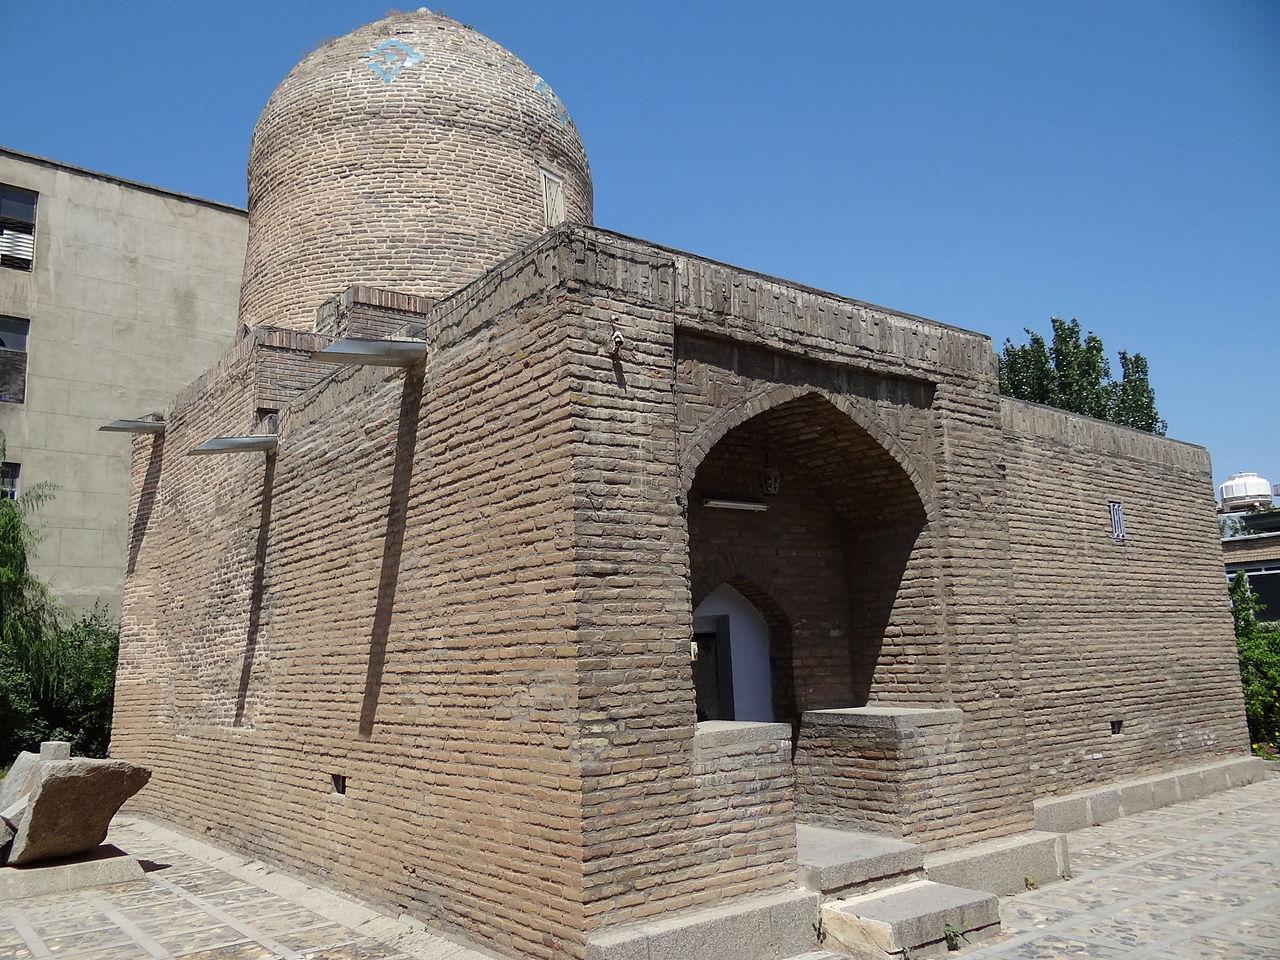 Tomb of Queen Esther and Mordechai in Hamedan, Iran